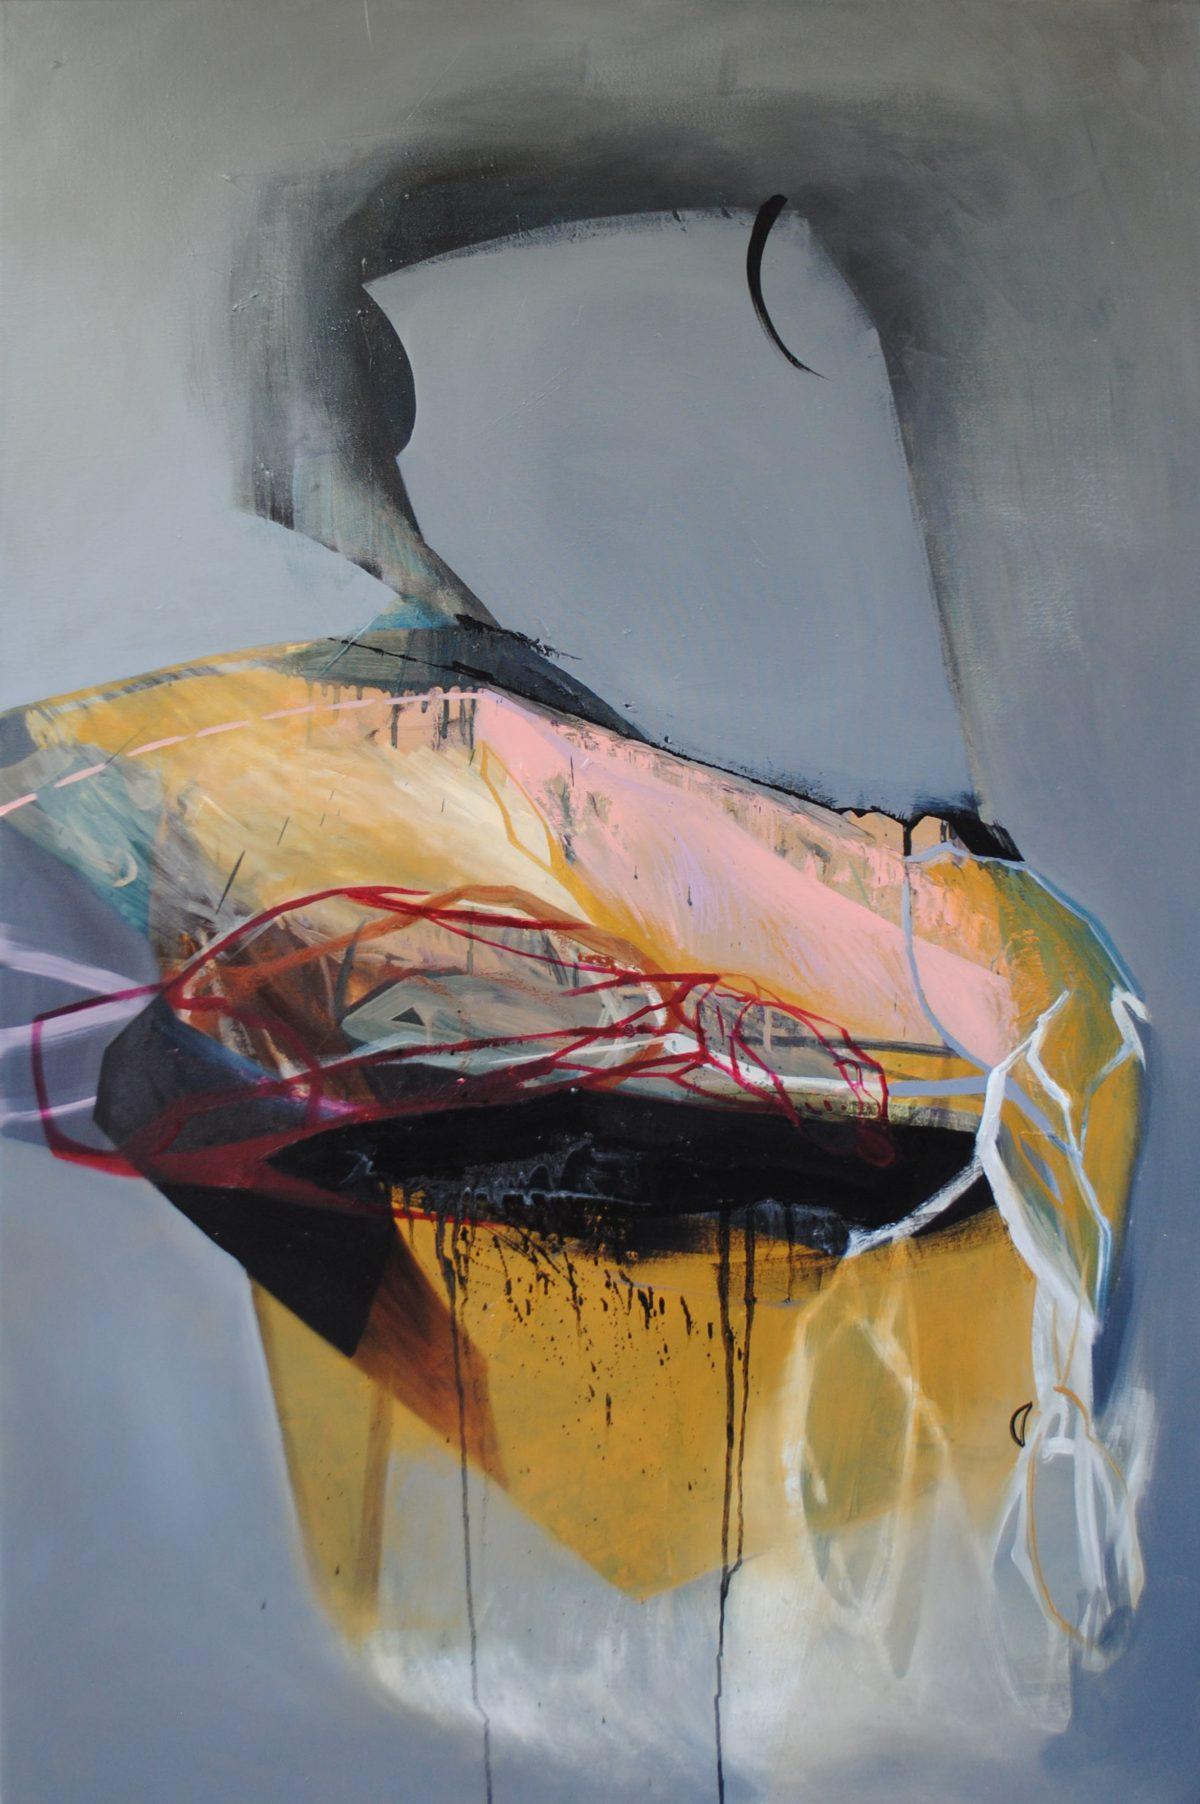 Fragments 4, acrylic and oil on canvas, 2019, 100x150 cm